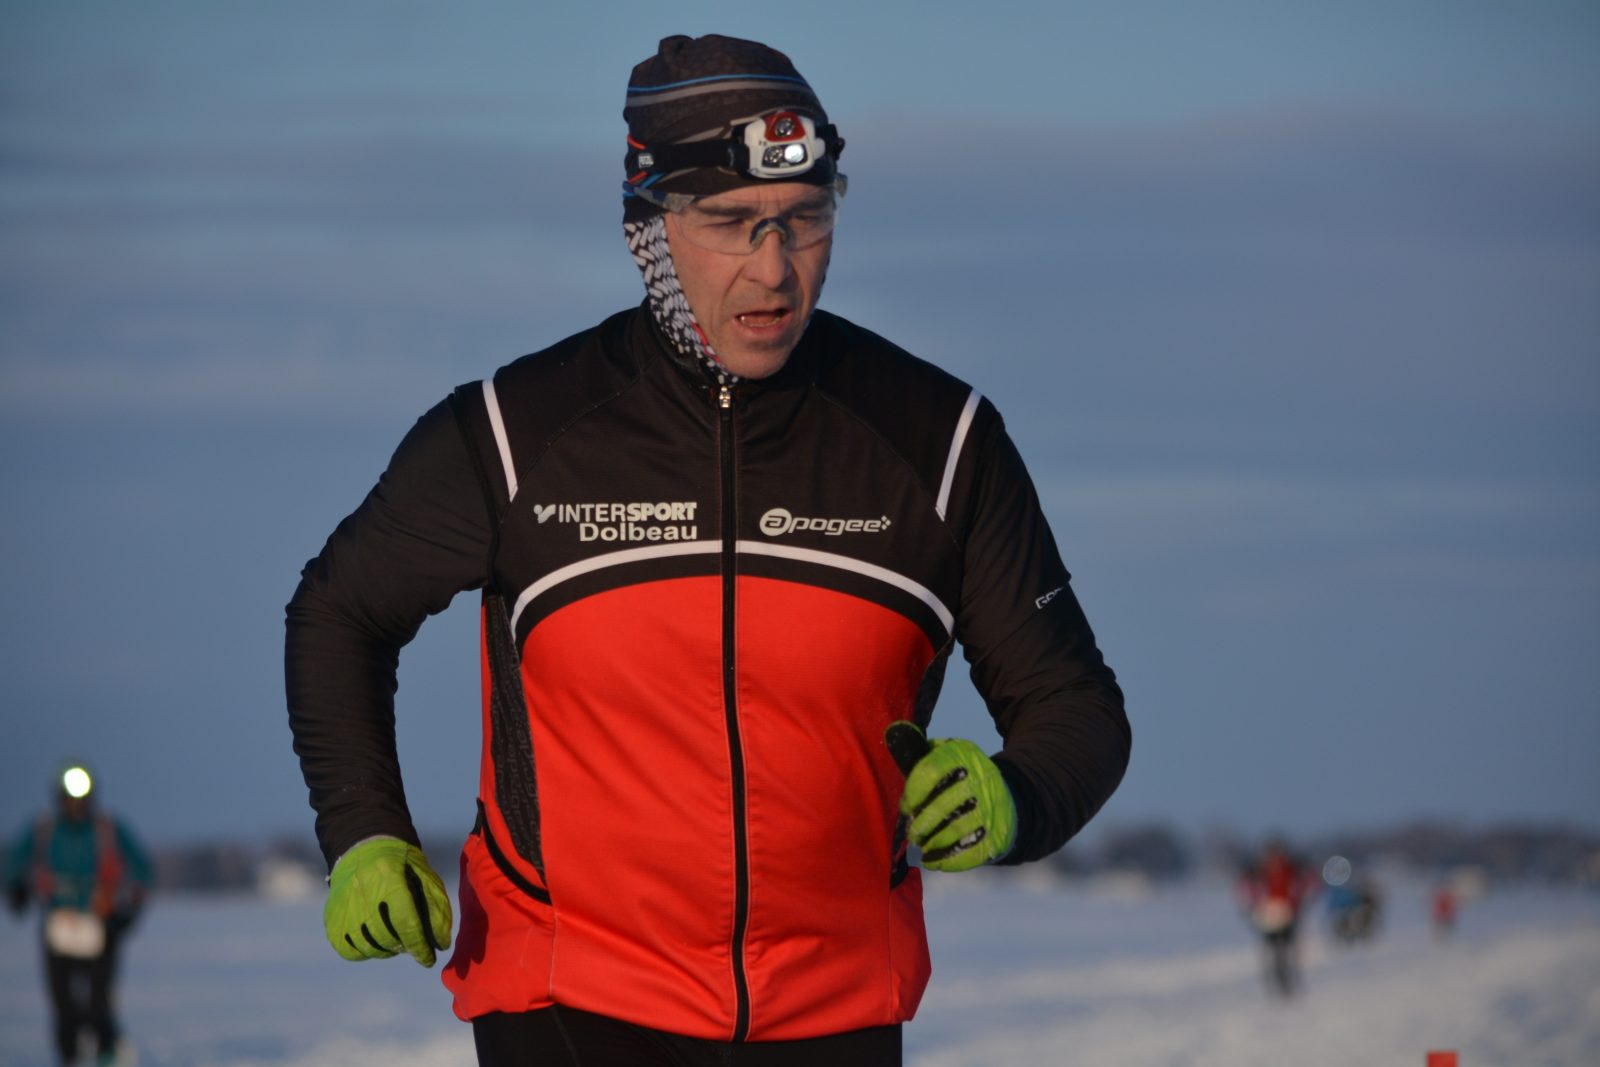 Stéphane Leroyer a couru 20 km avec un genou blessé